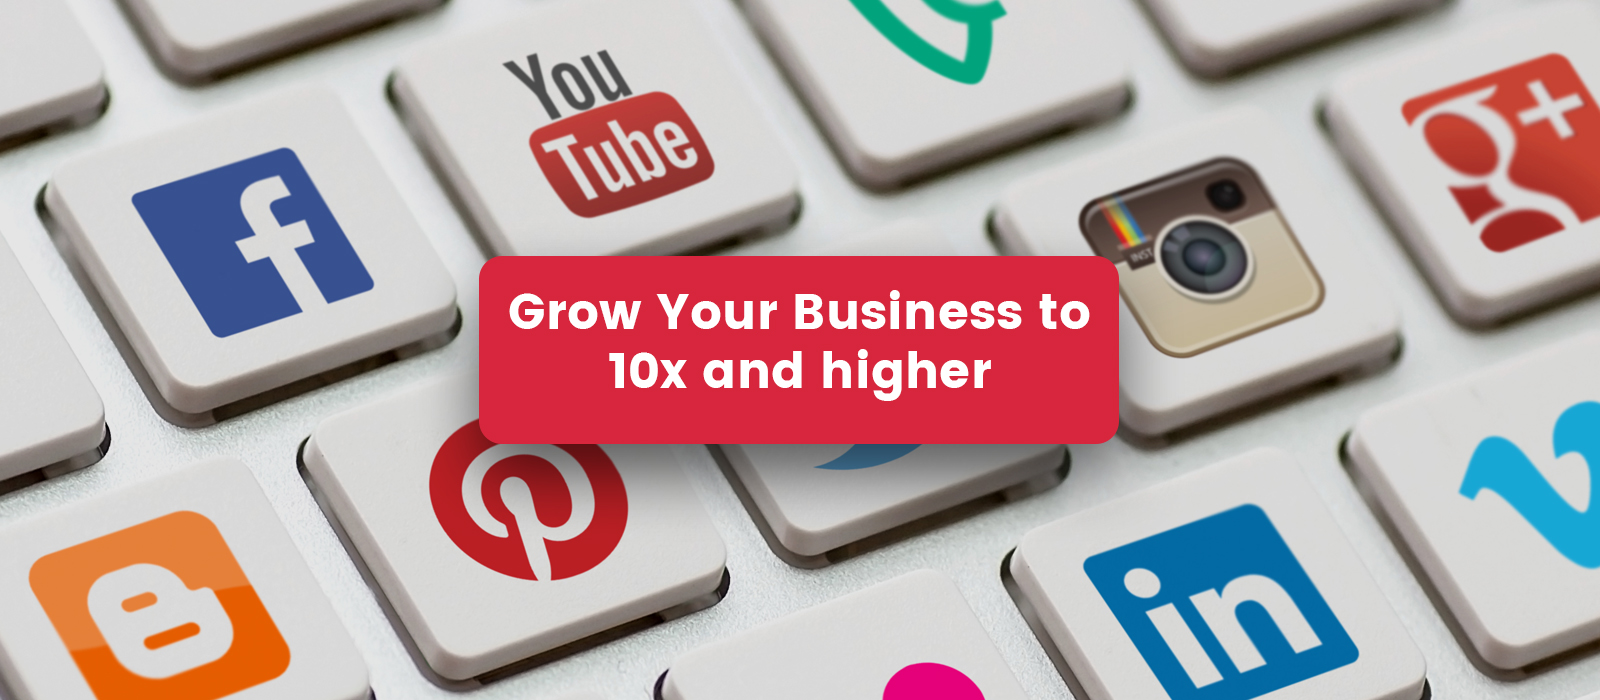 digital-marketing-tools-course-pouya-eti2